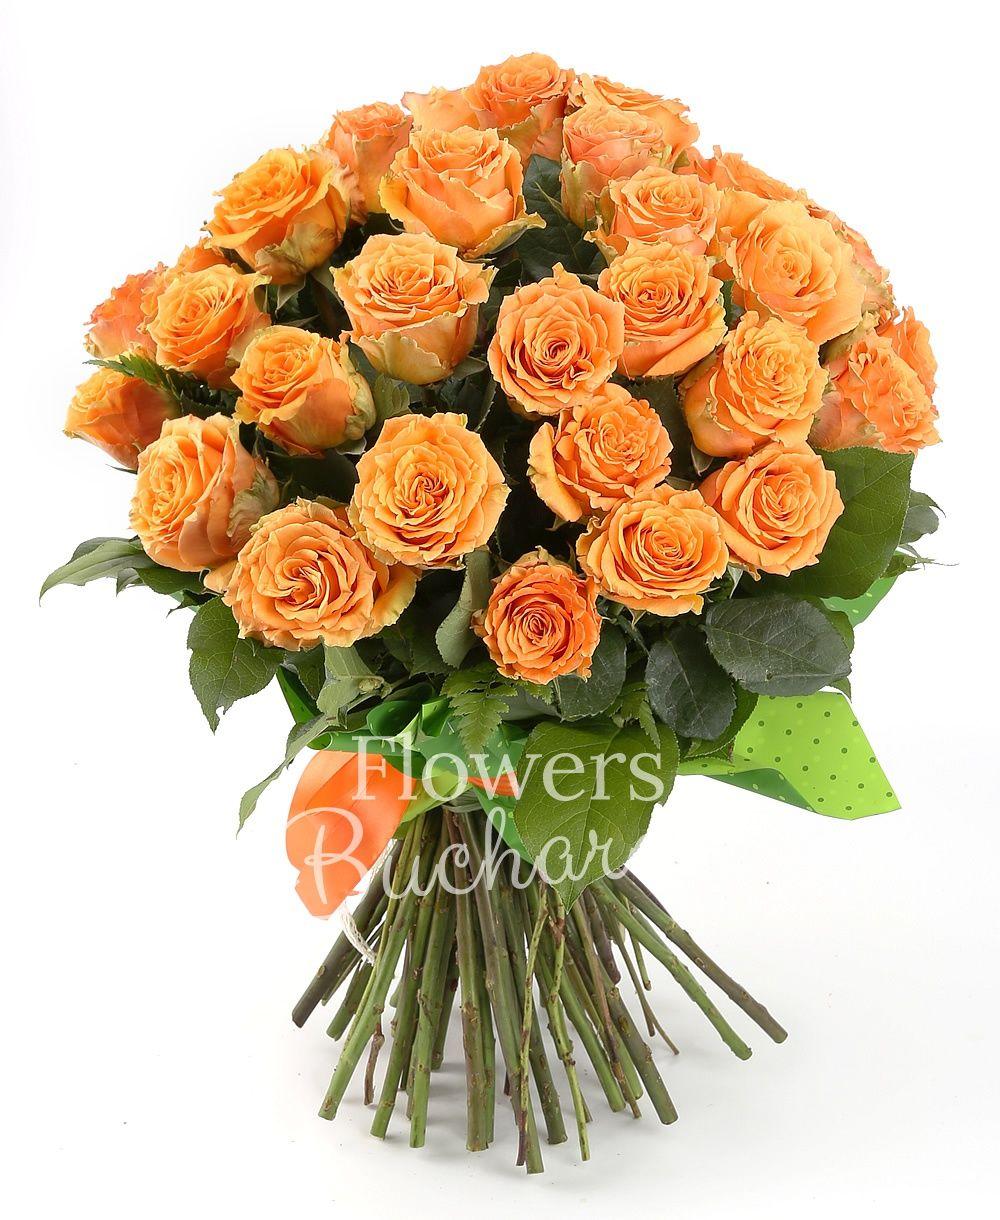 31 orange roses, greenery